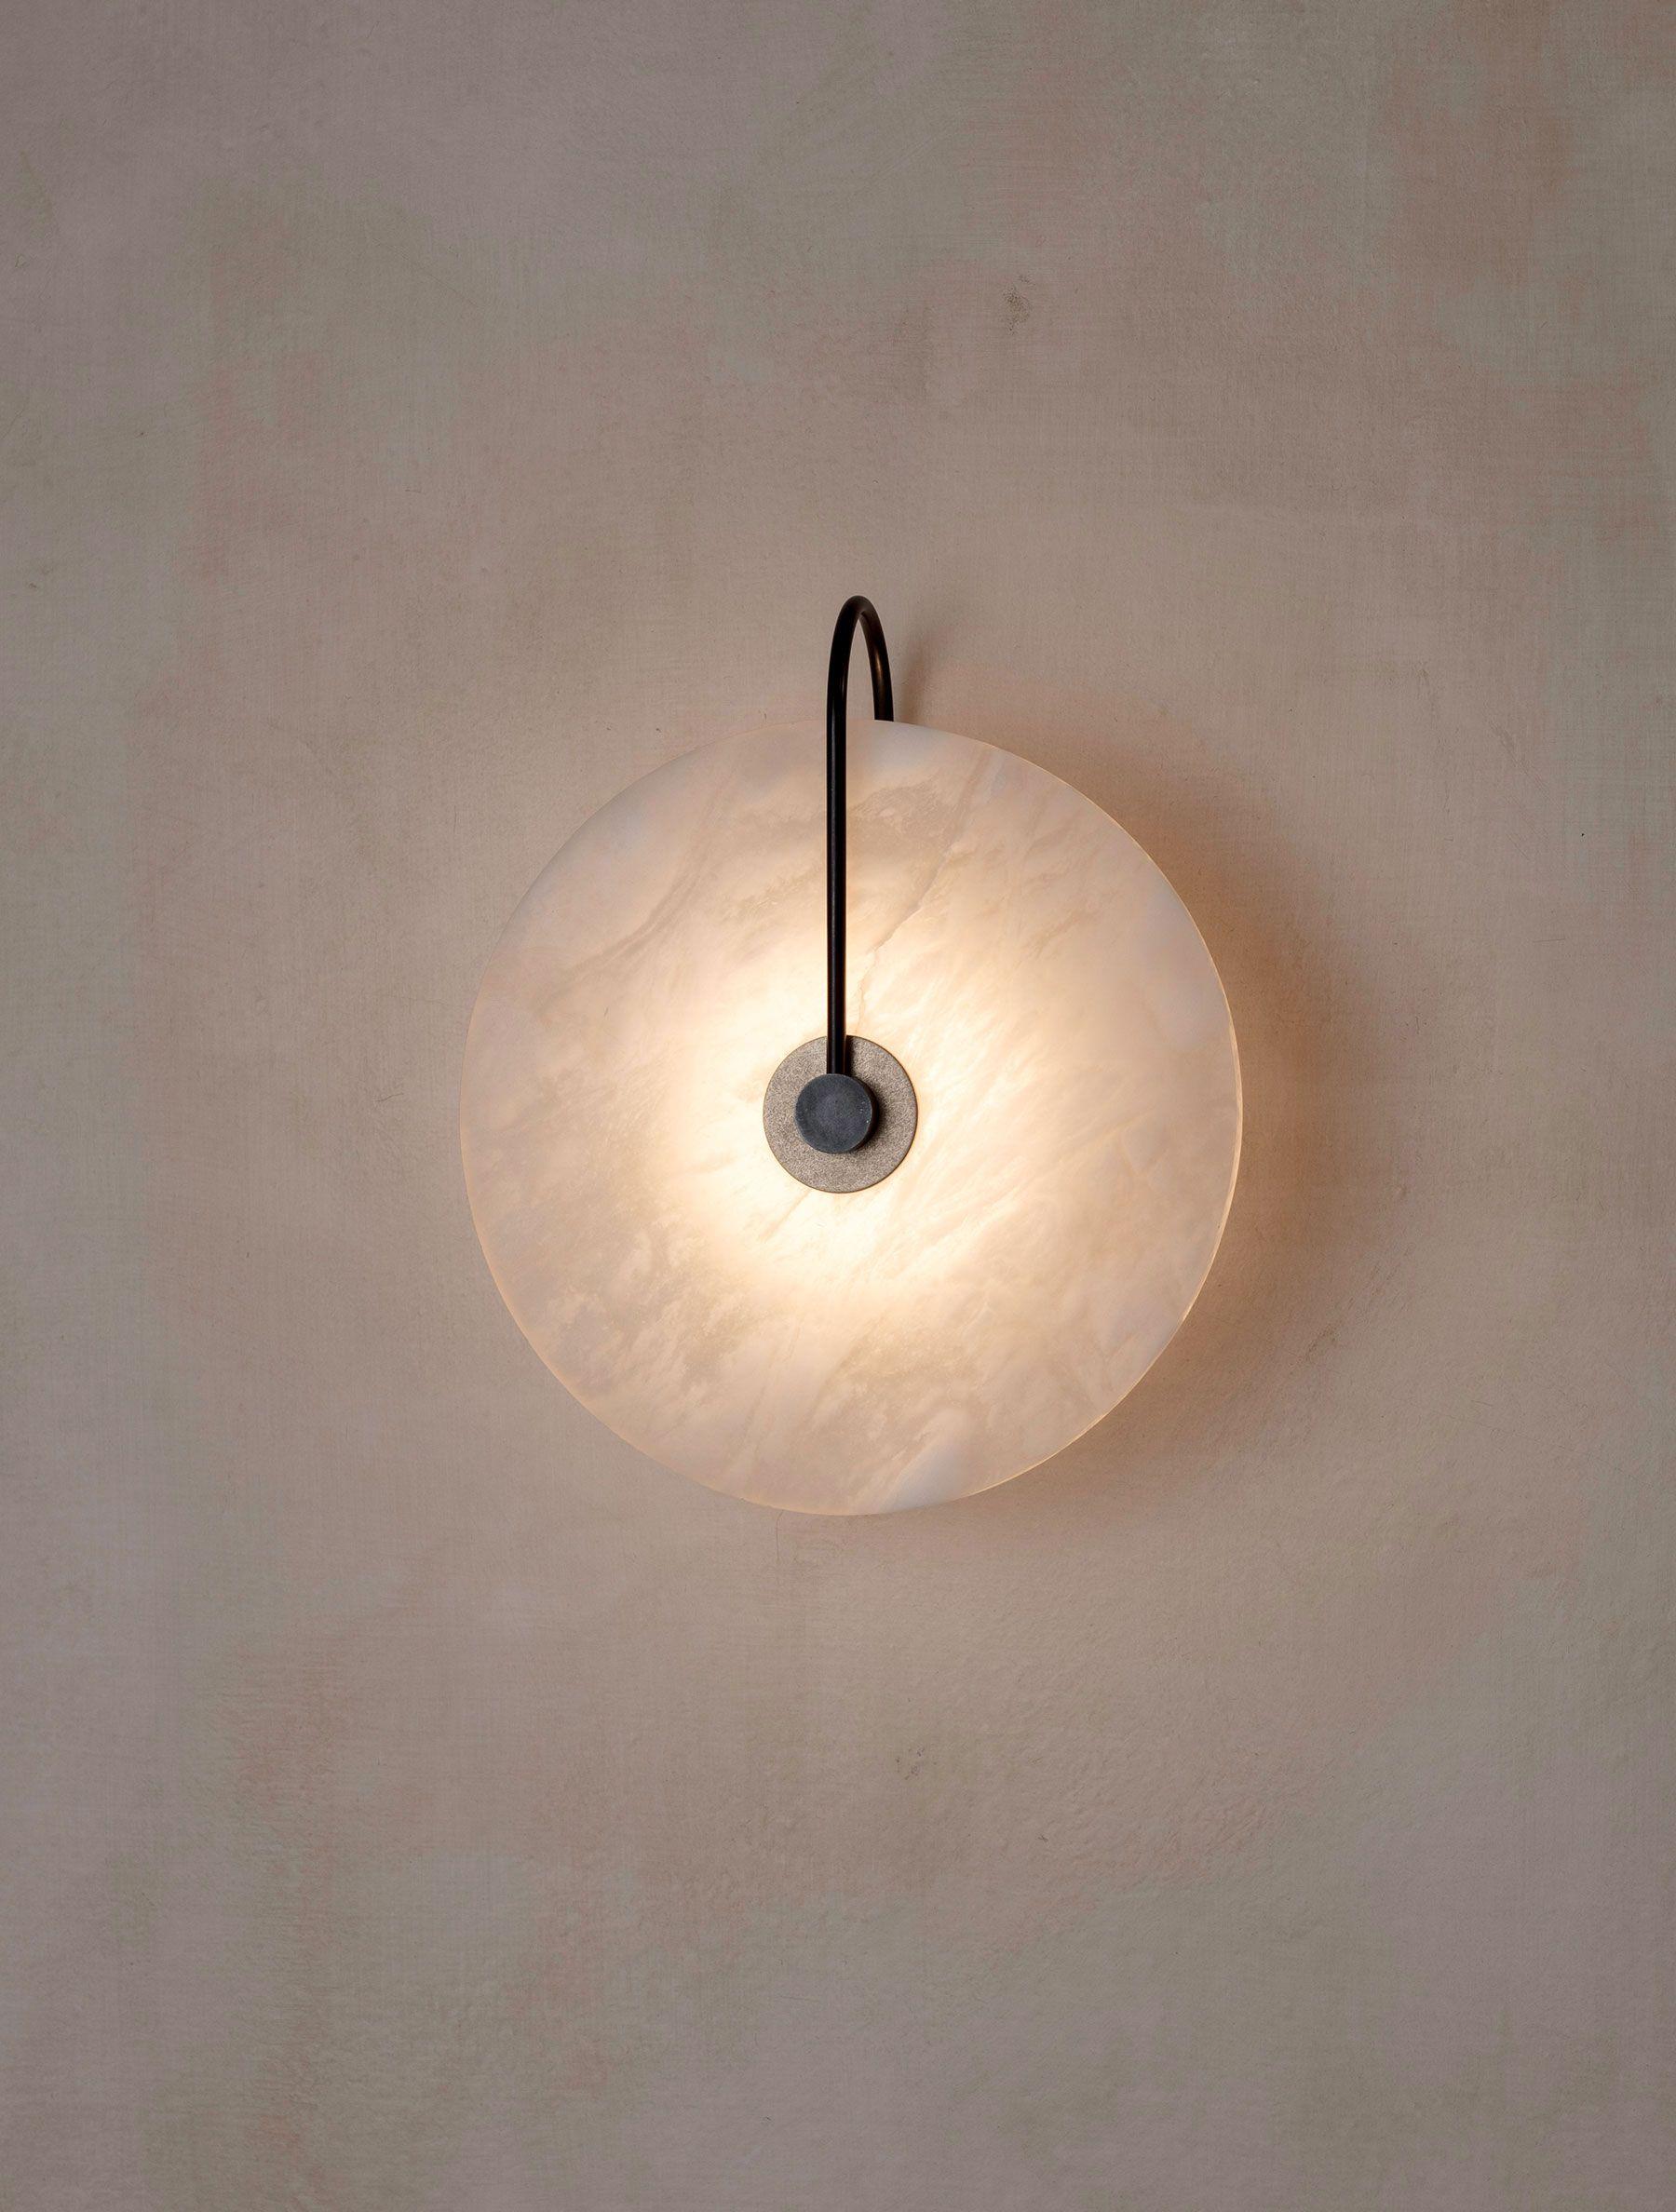 Ada Alabaster Sconce 10 Indoor Wall Sconces Indoor Wall Lights Contemporary Lighting Design